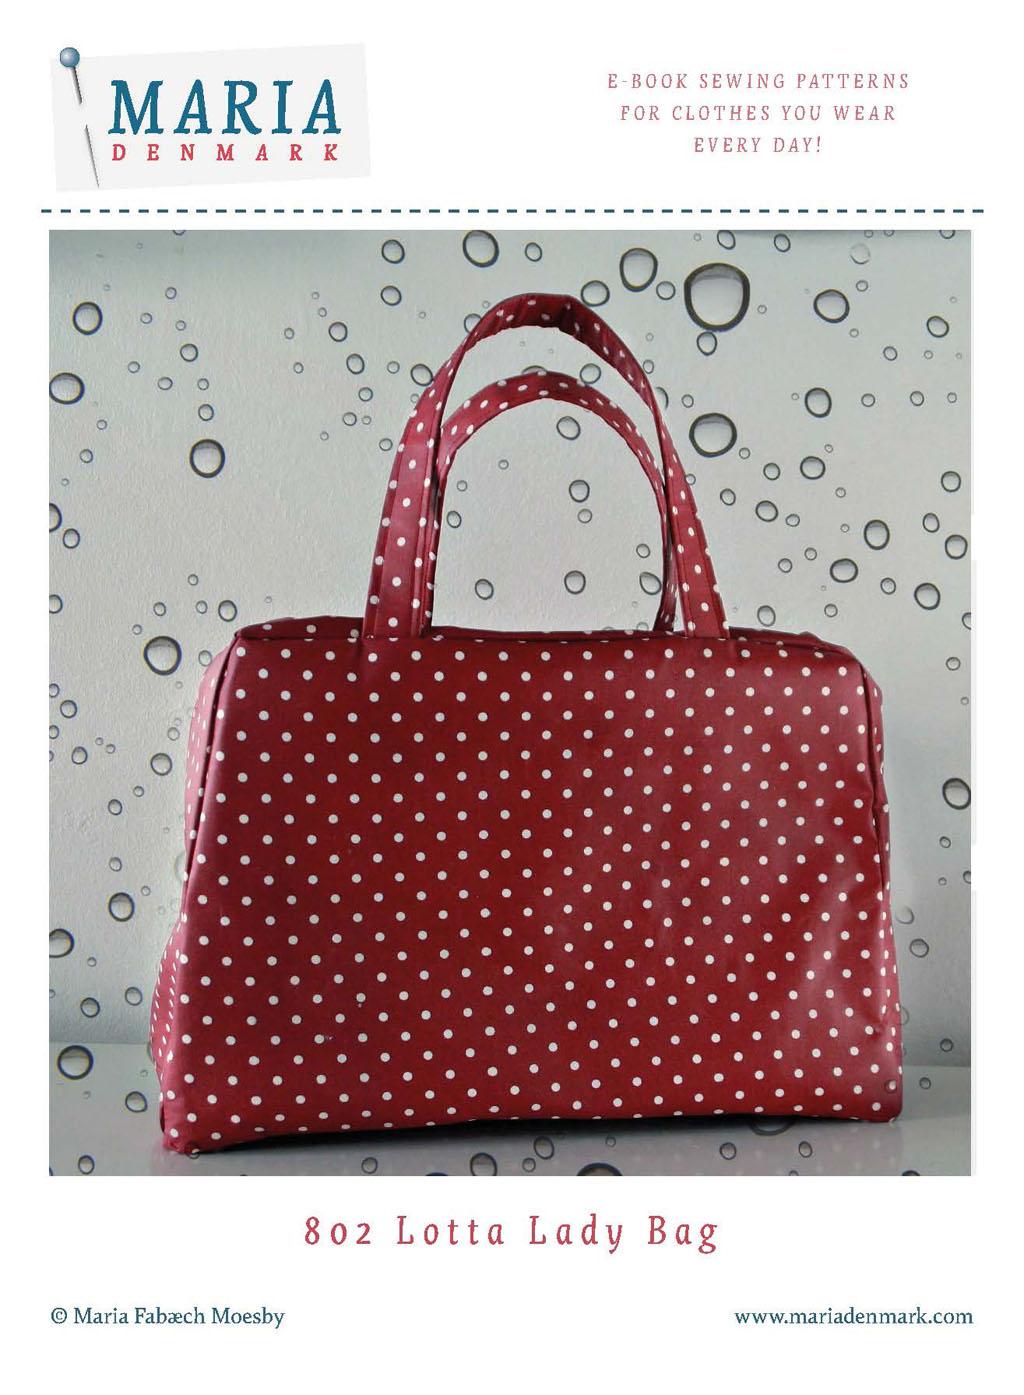 MariaDenmark Lotta Lady Bag Downloadable Pattern 802